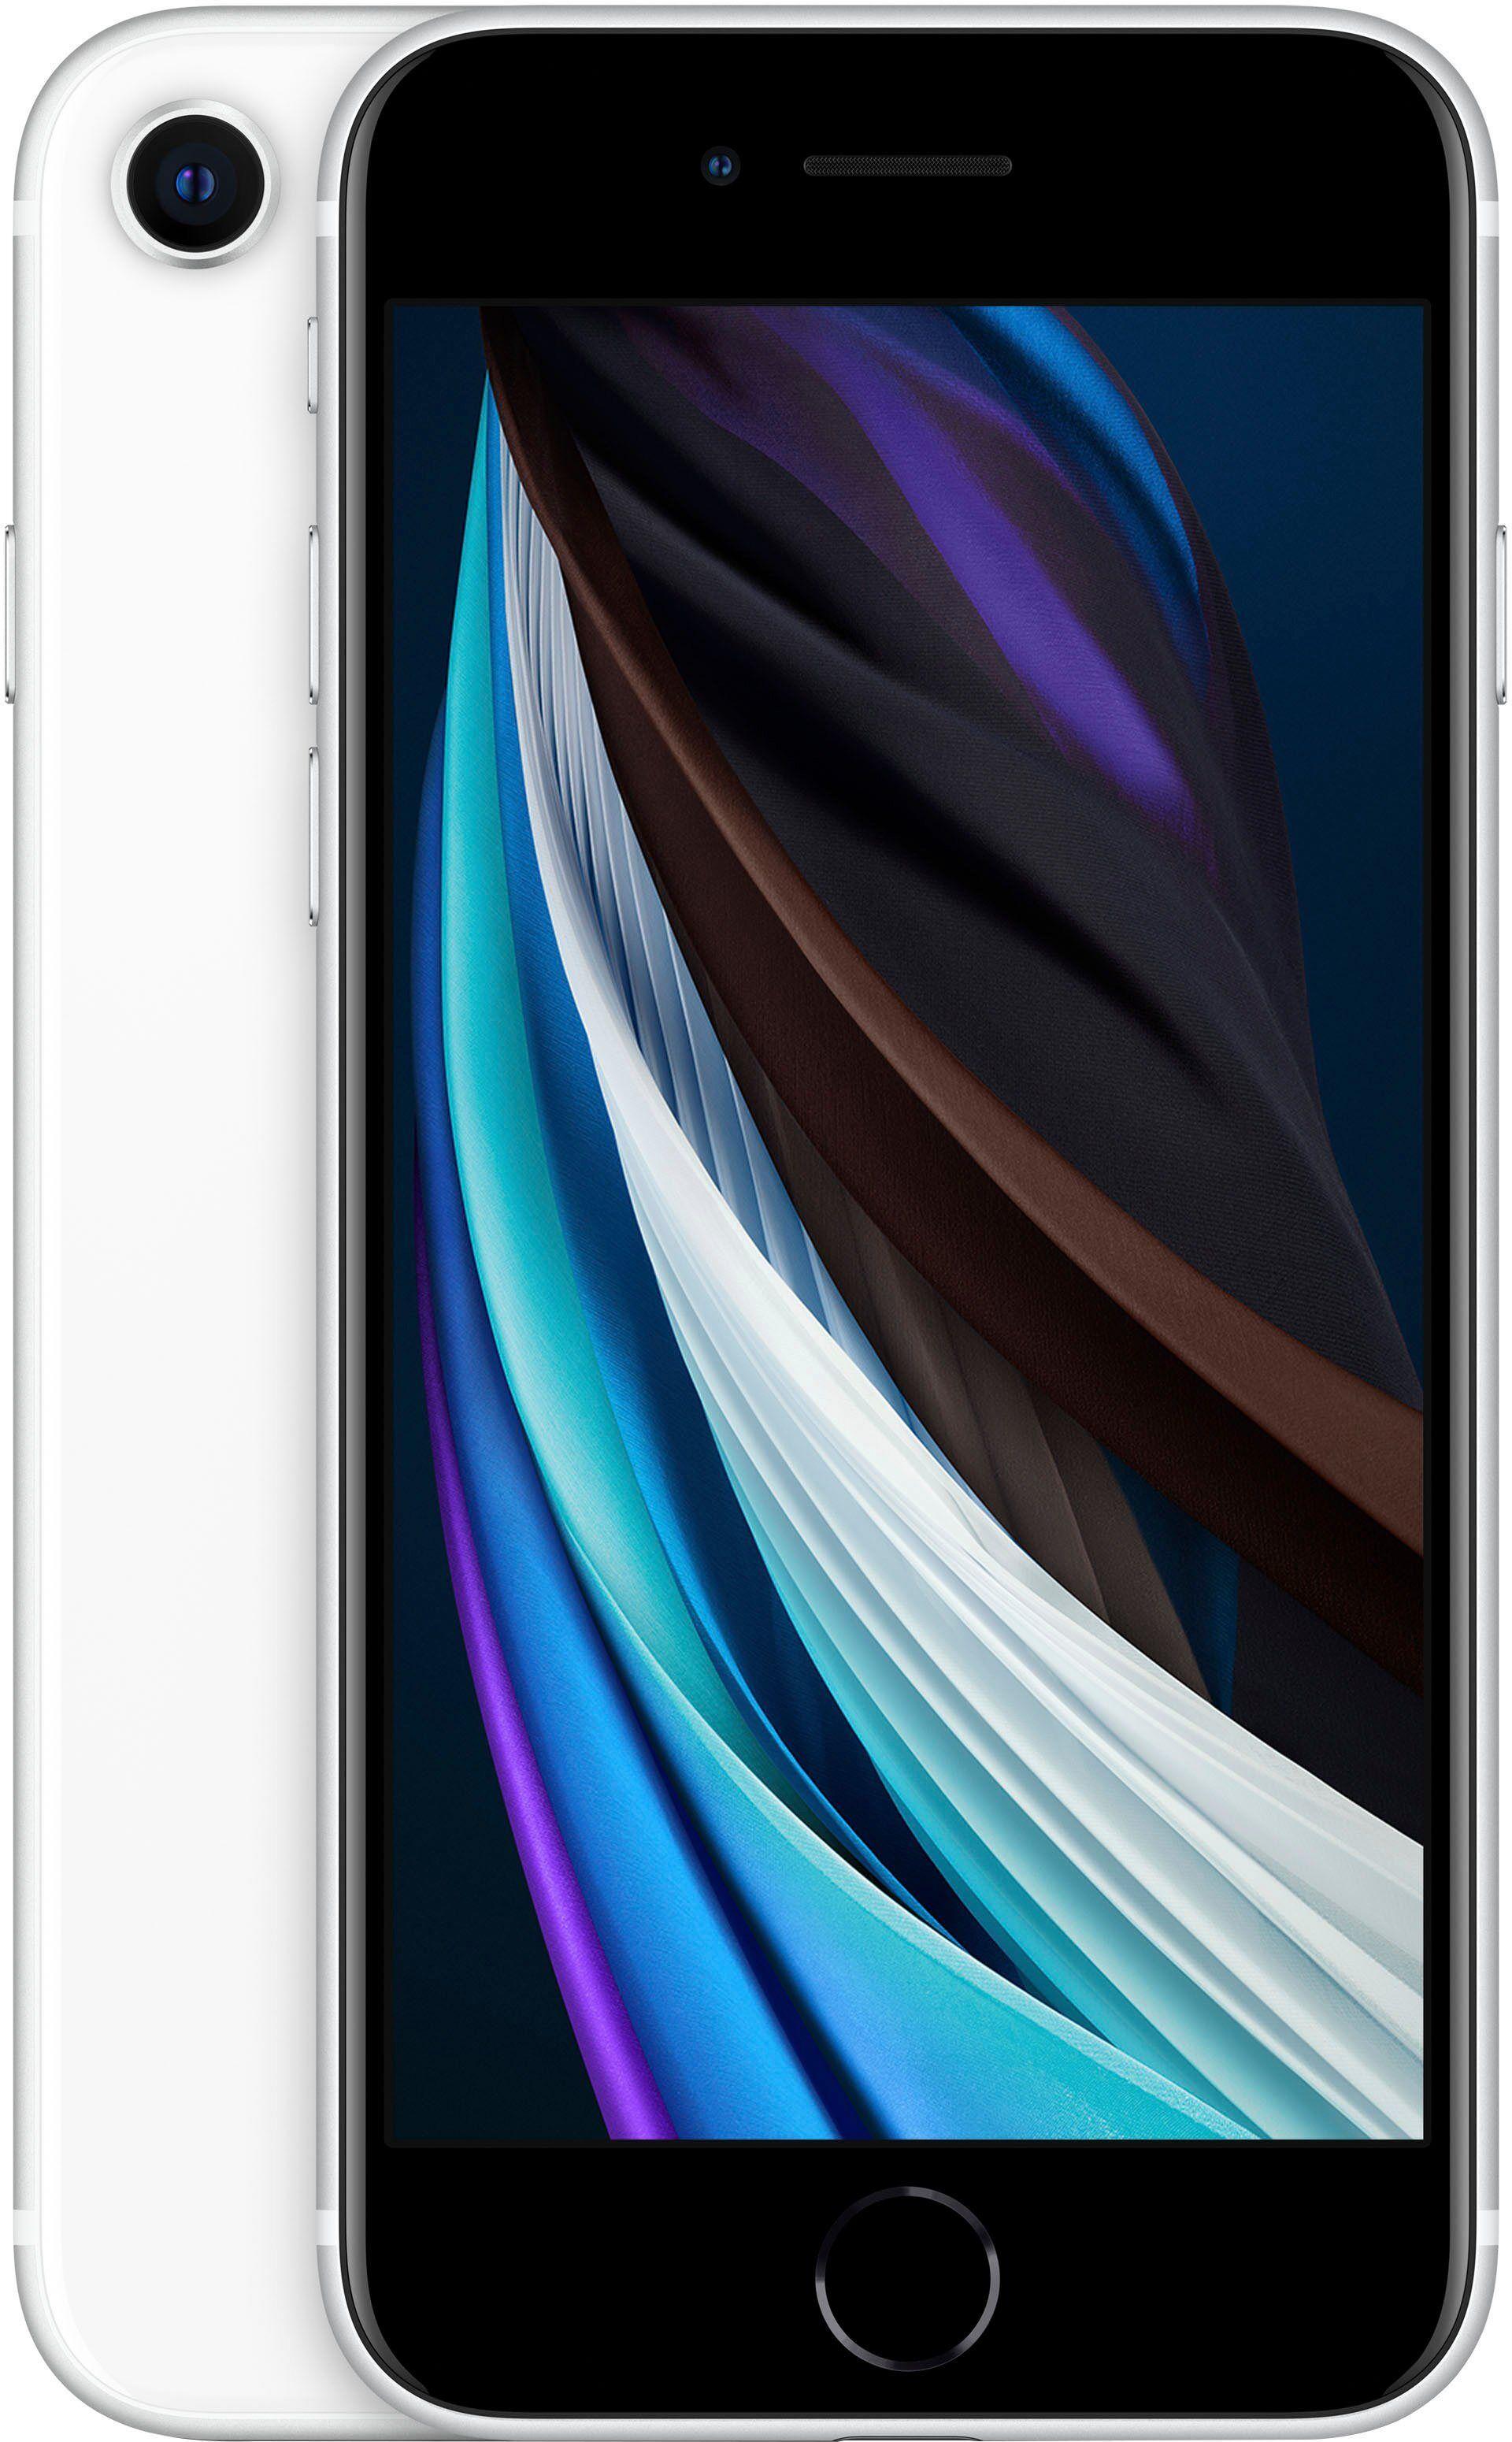 Apple iPhone SE 128GB Smartphone (11,94 cm/4,7 Zoll, 128 GB Speicherplatz, 12 MP Kamera, inkl. Lightning Kabel und Earpods), weiß